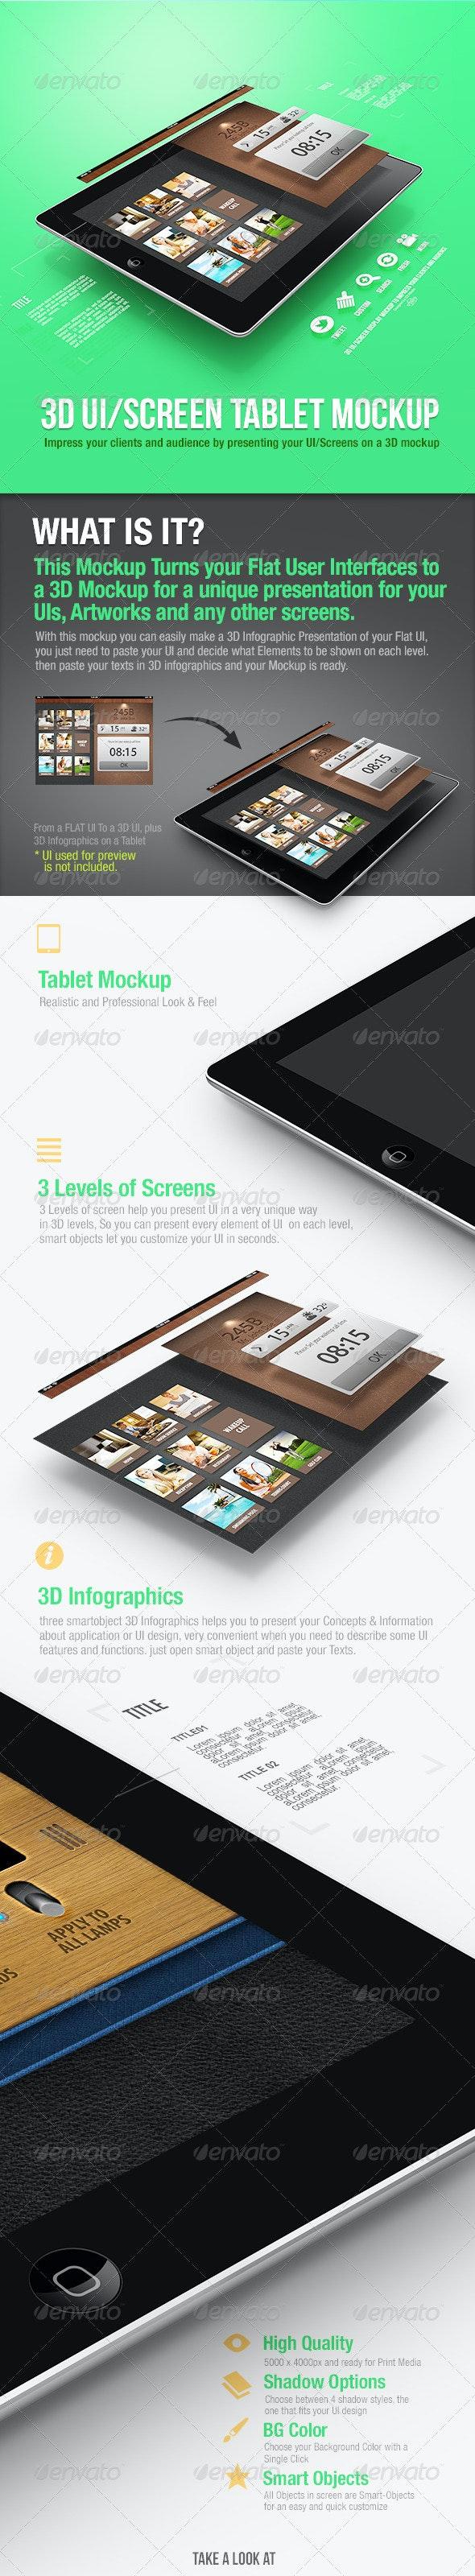 3D UI/Screen Tablet Mockup - Mobile Displays